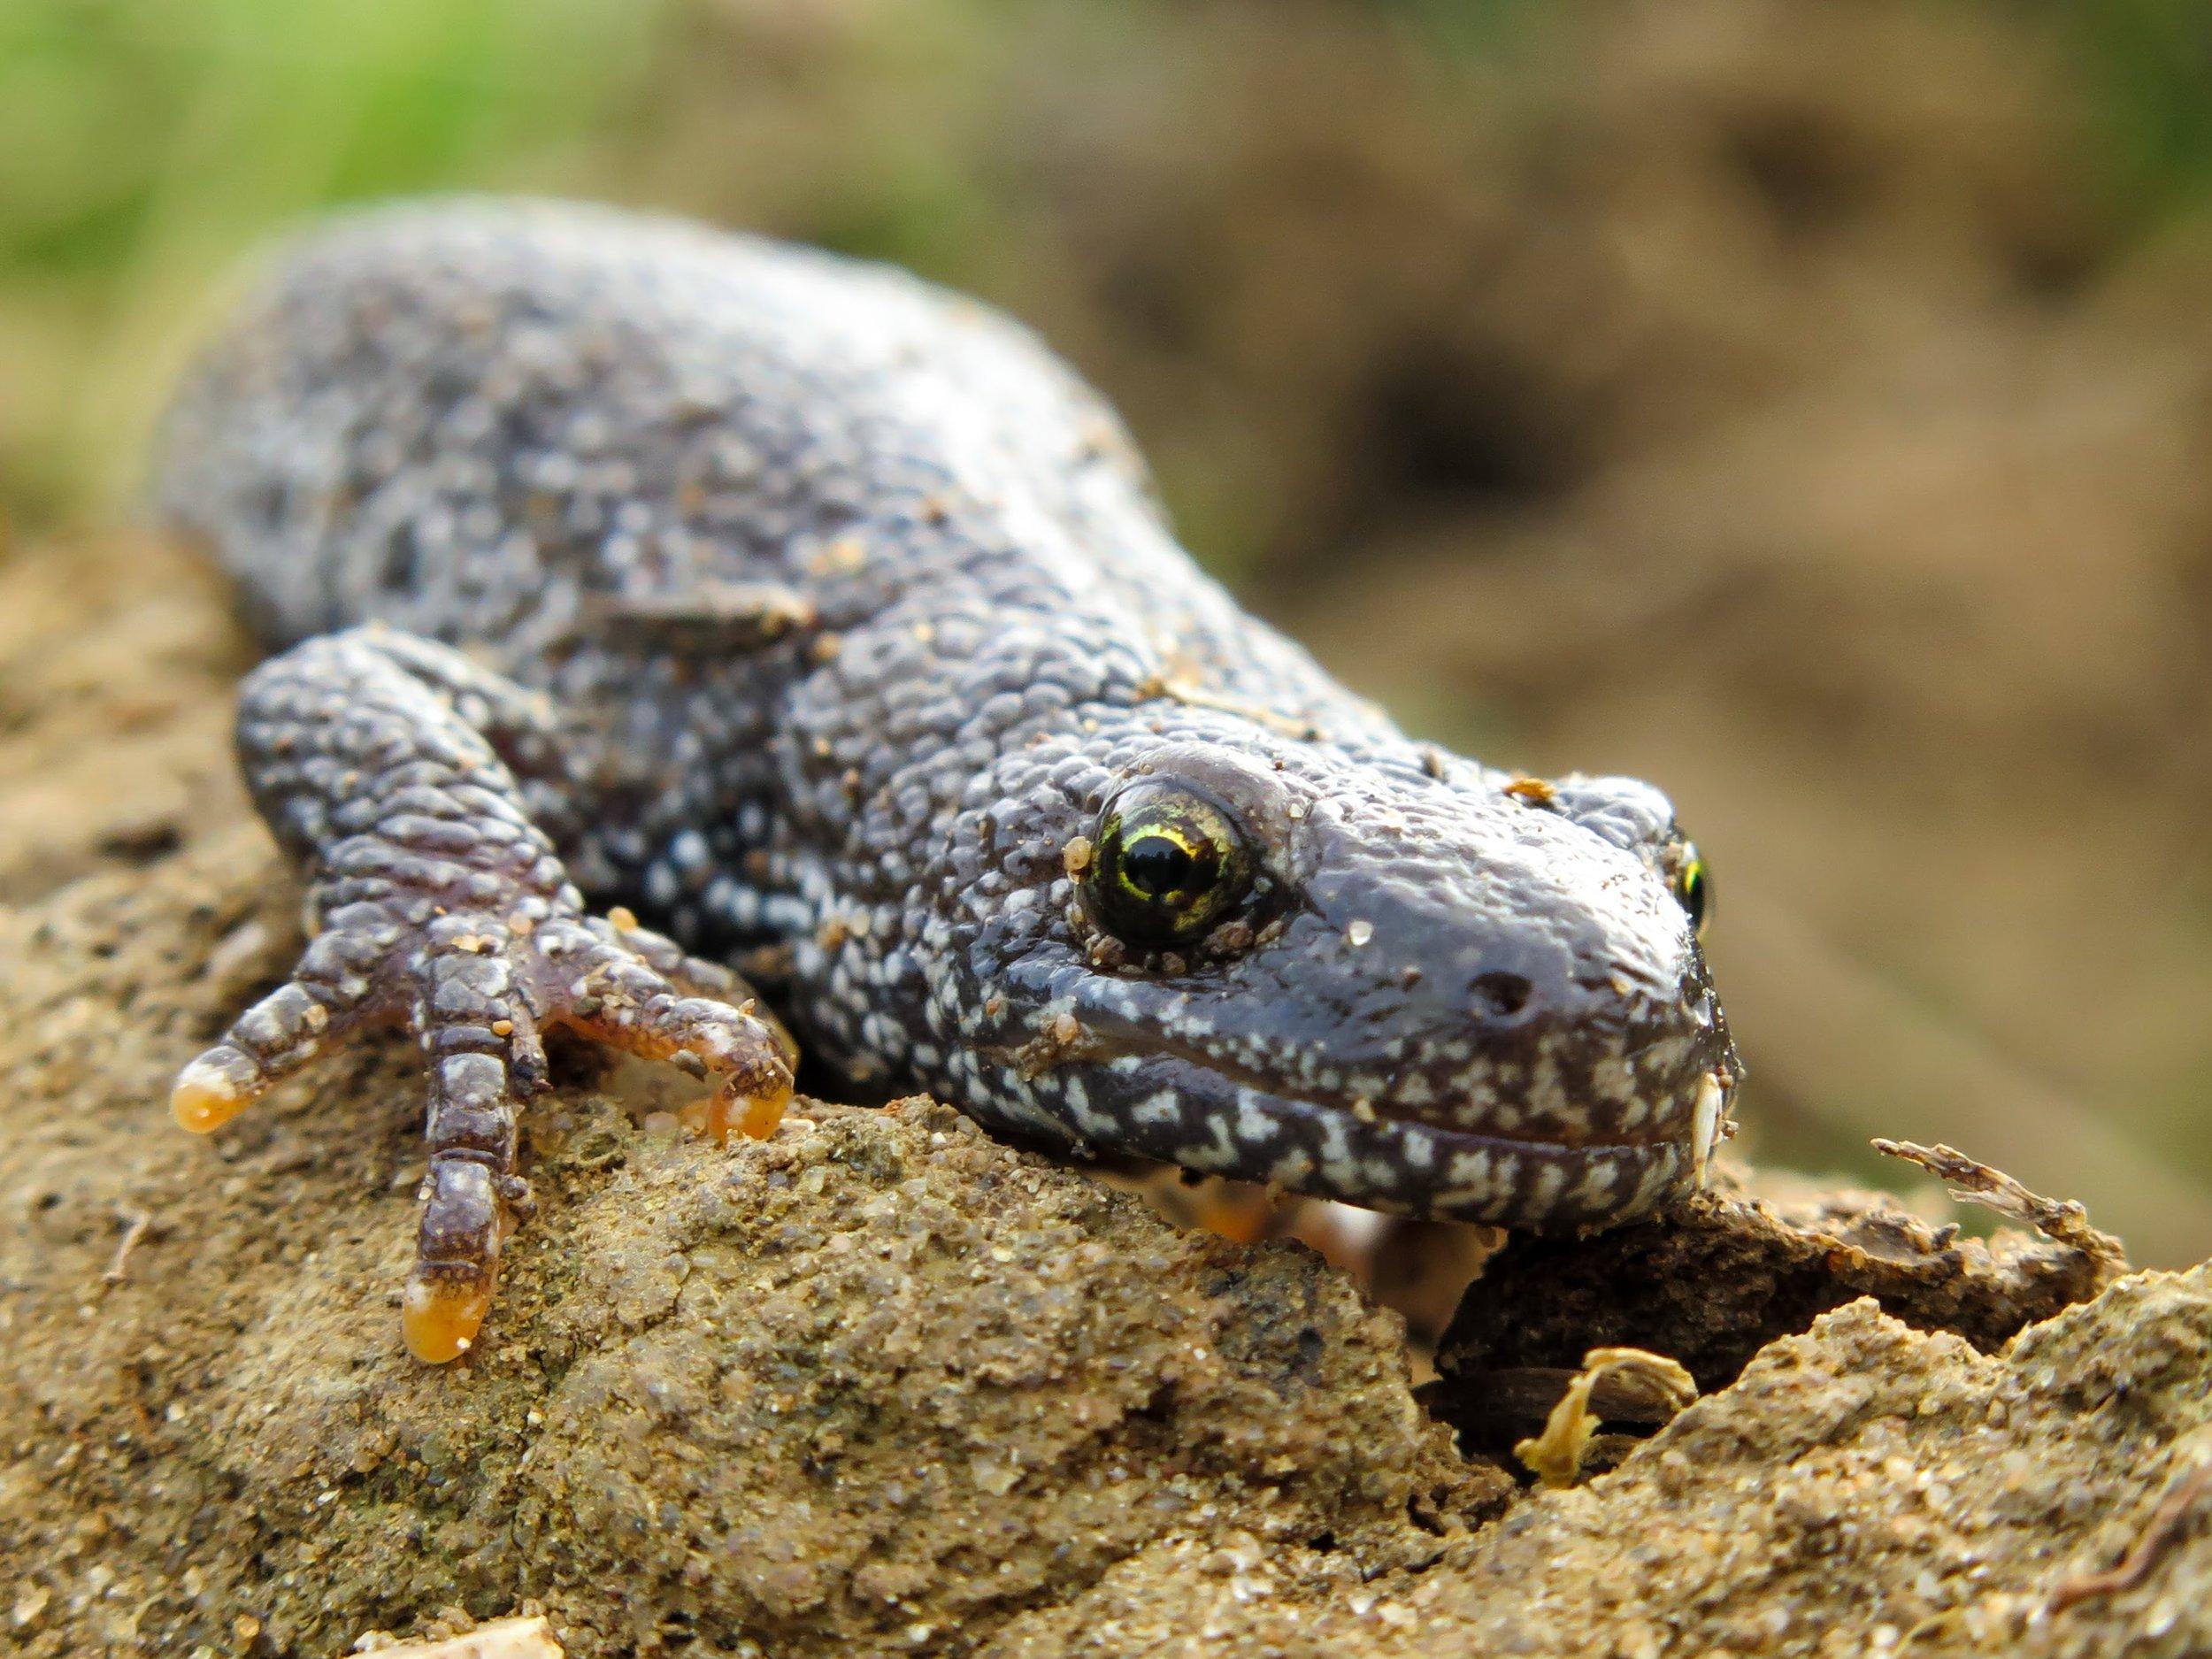 Great crested newt in terrestrial habitat